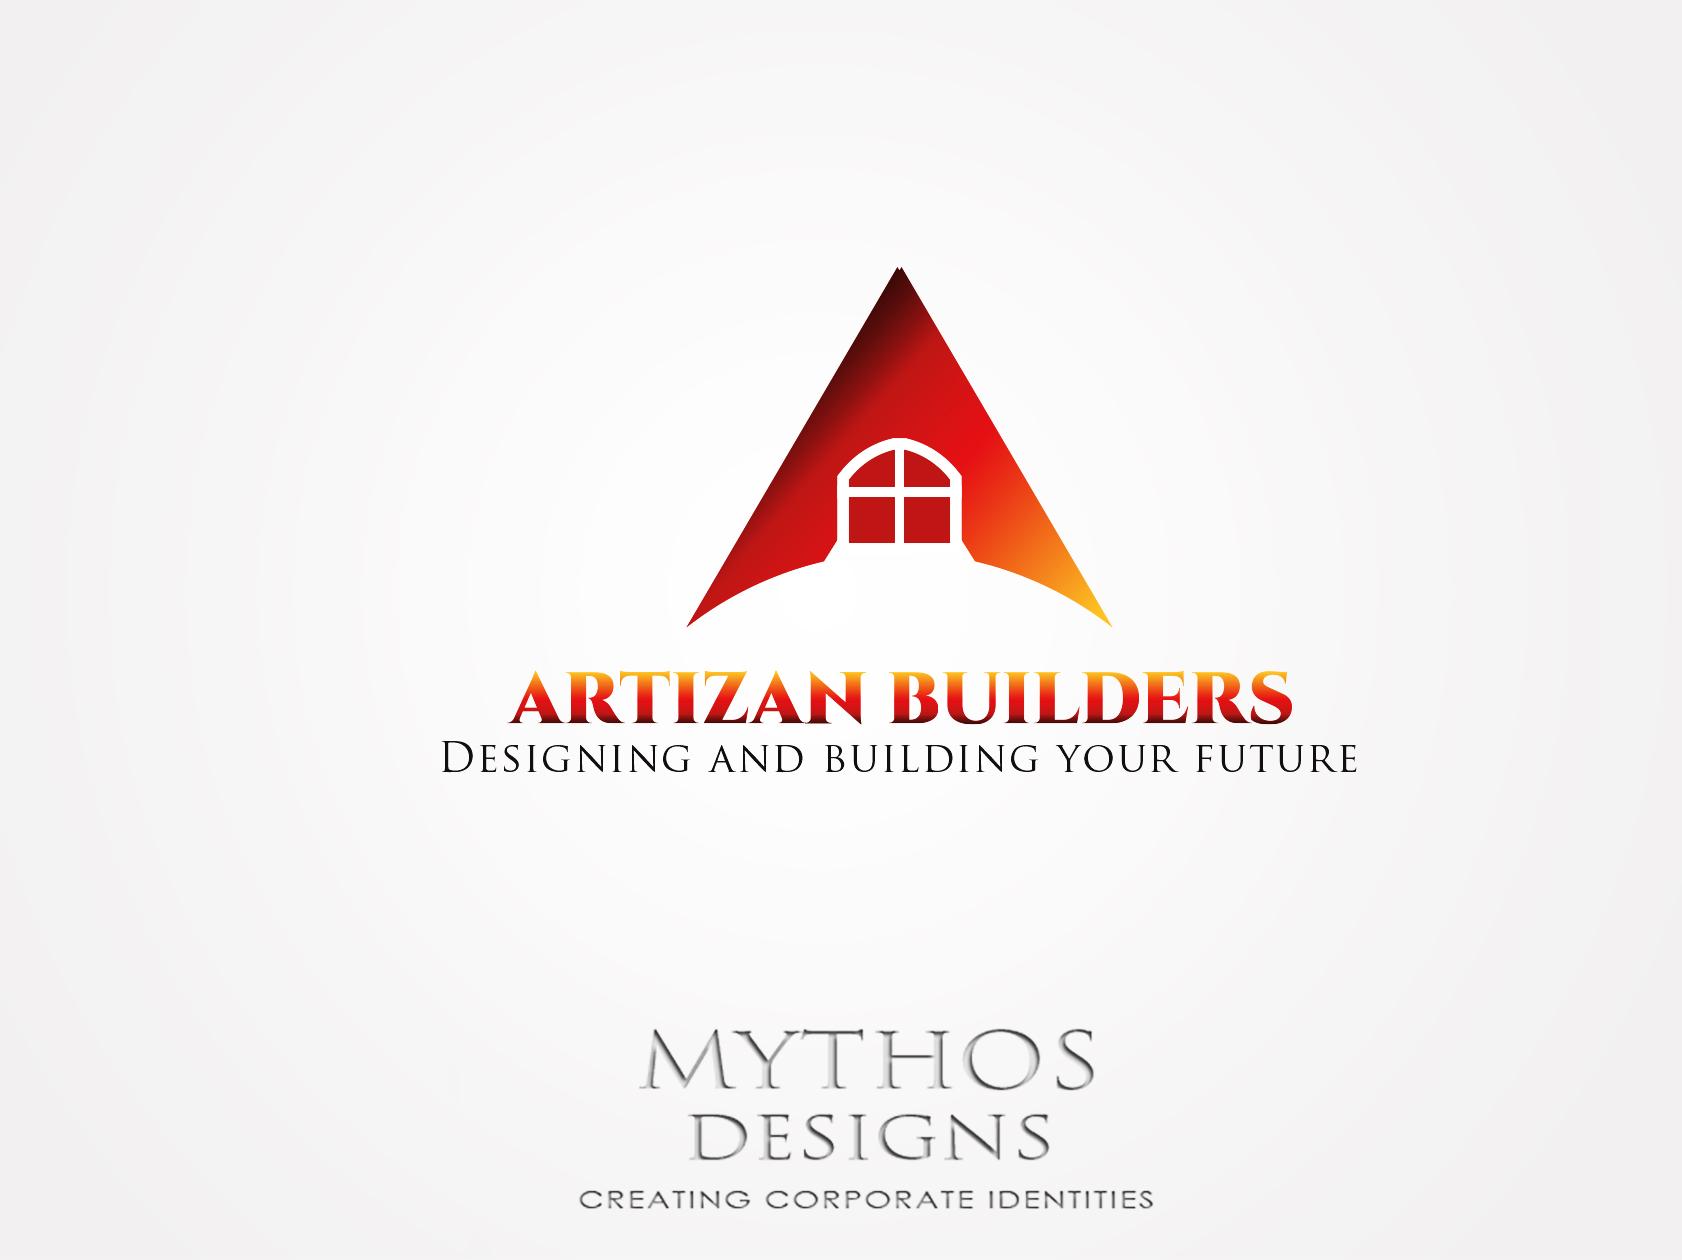 Logo Design by Mythos Designs - Entry No. 181 in the Logo Design Contest Captivating Logo Design for Artisan Builders.